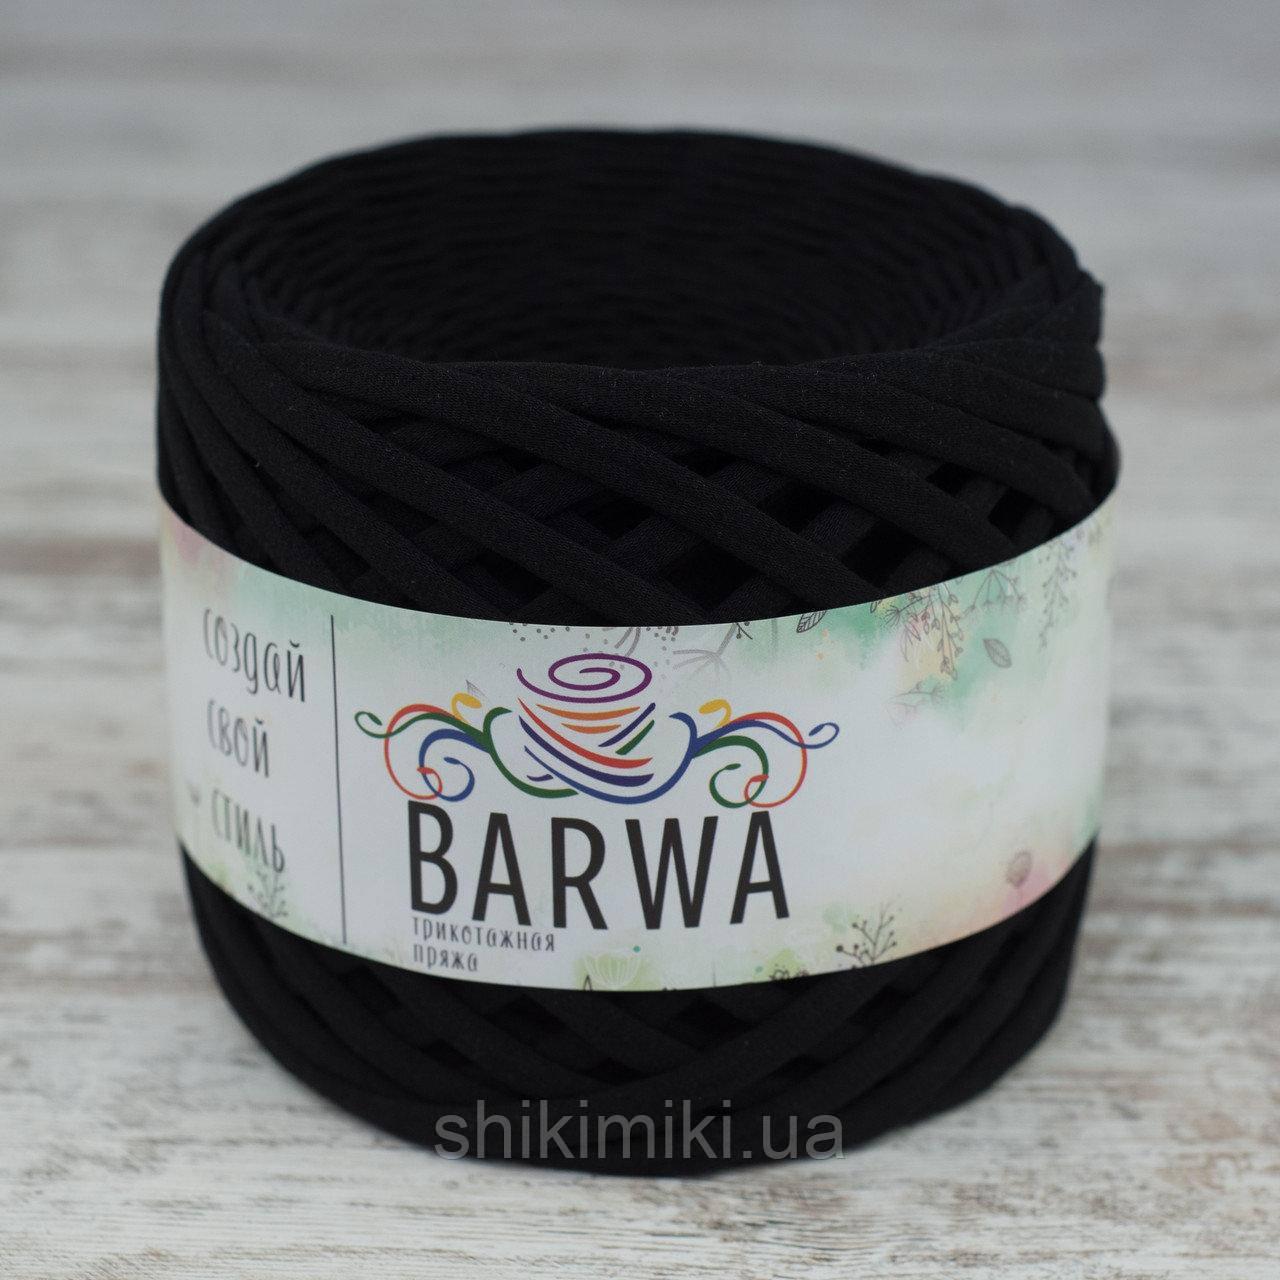 Трикотажная пряжа Barwa (7-9 мм), цвет Черный бархат